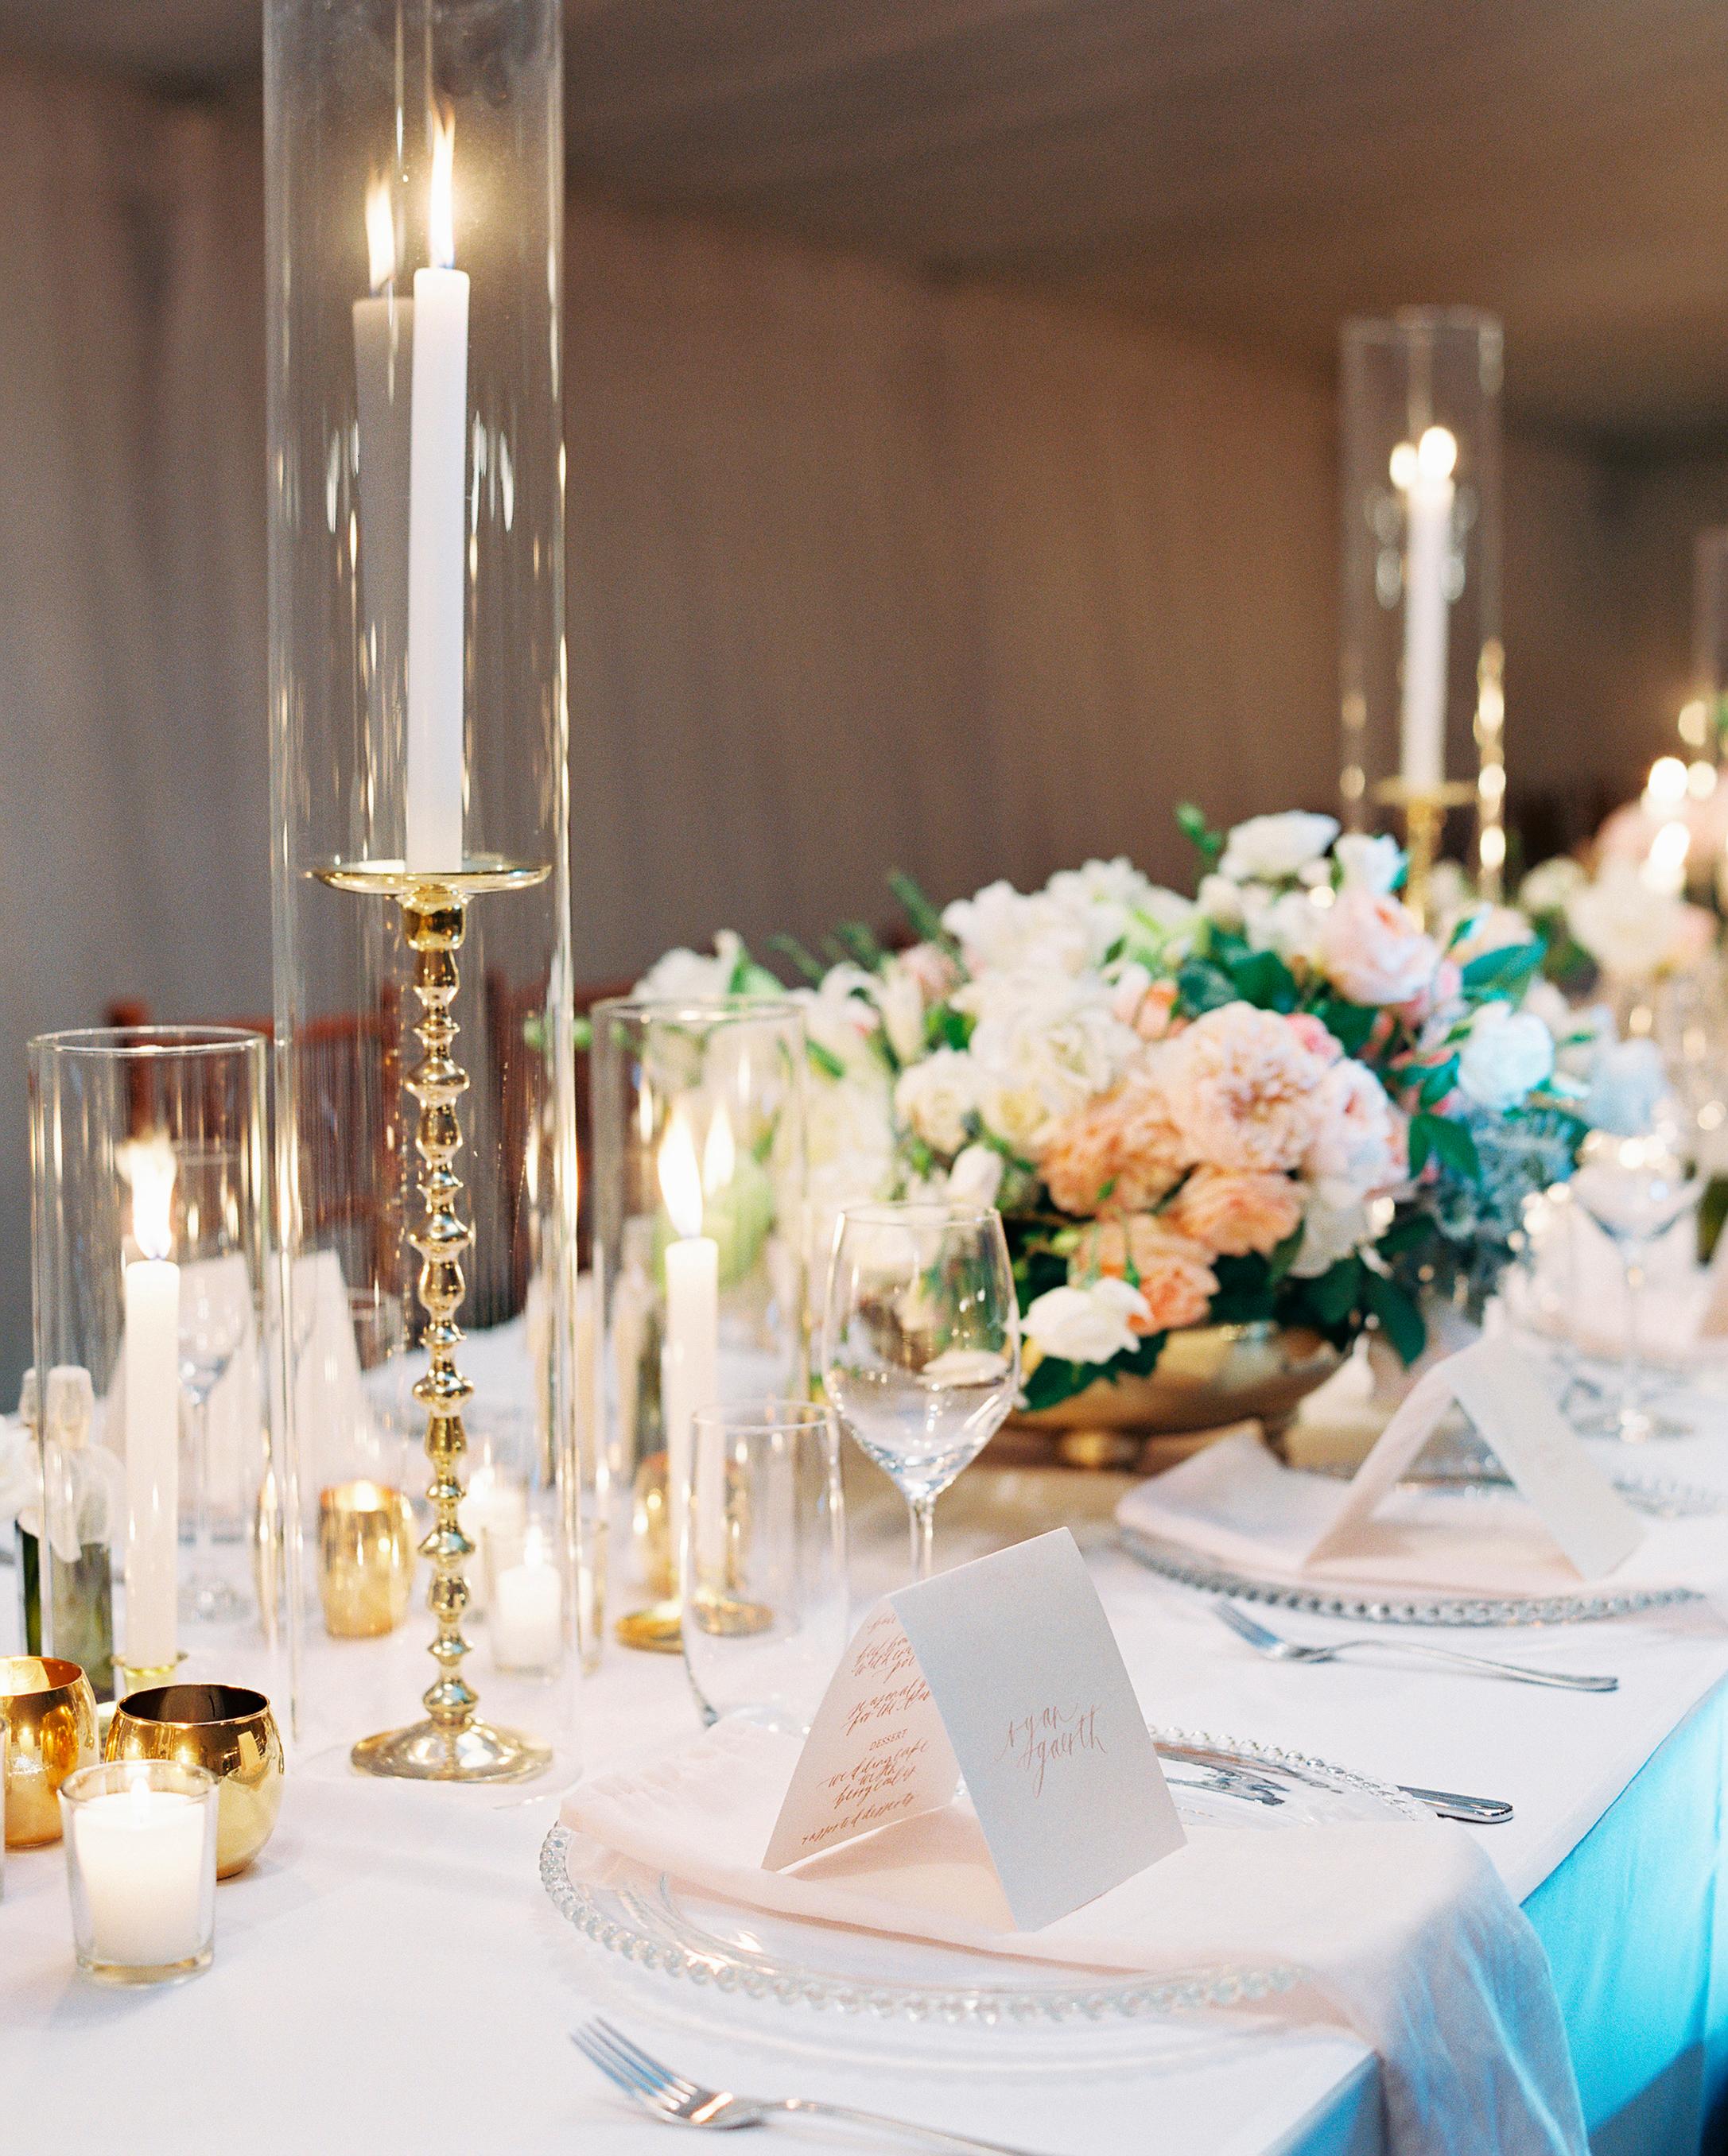 jemma-michael-wedding-centerpieces-002600011-s112110-0815.jpg